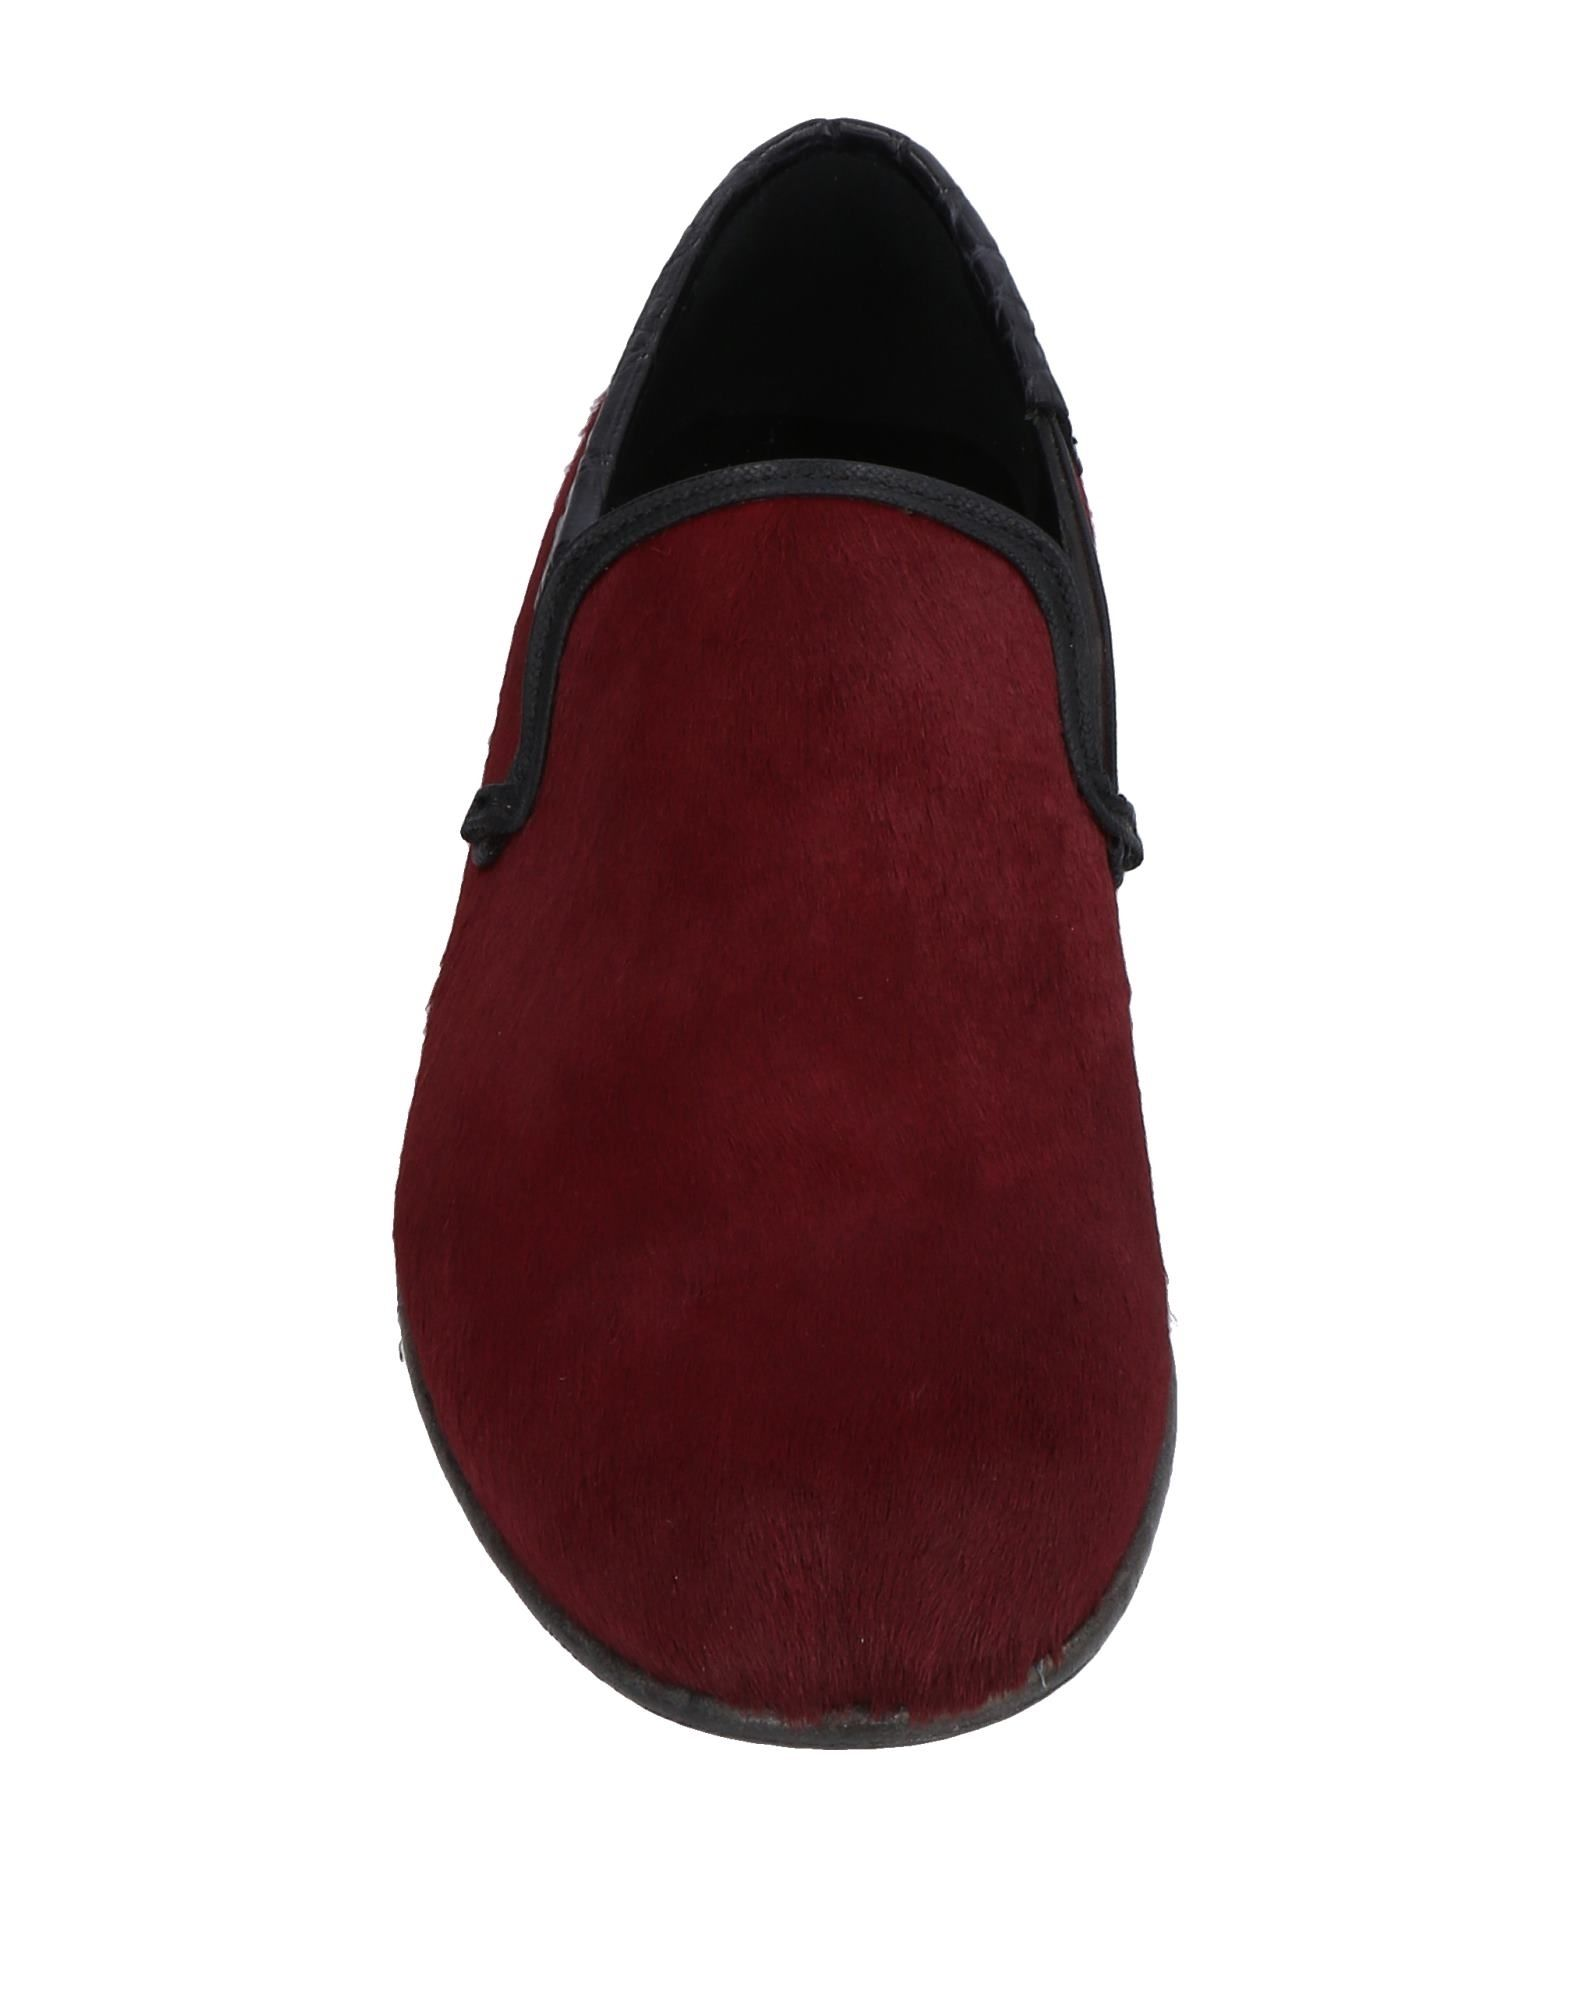 Dolce Herren & Gabbana Mokassins Herren Dolce  11492446MD Neue Schuhe d2823e